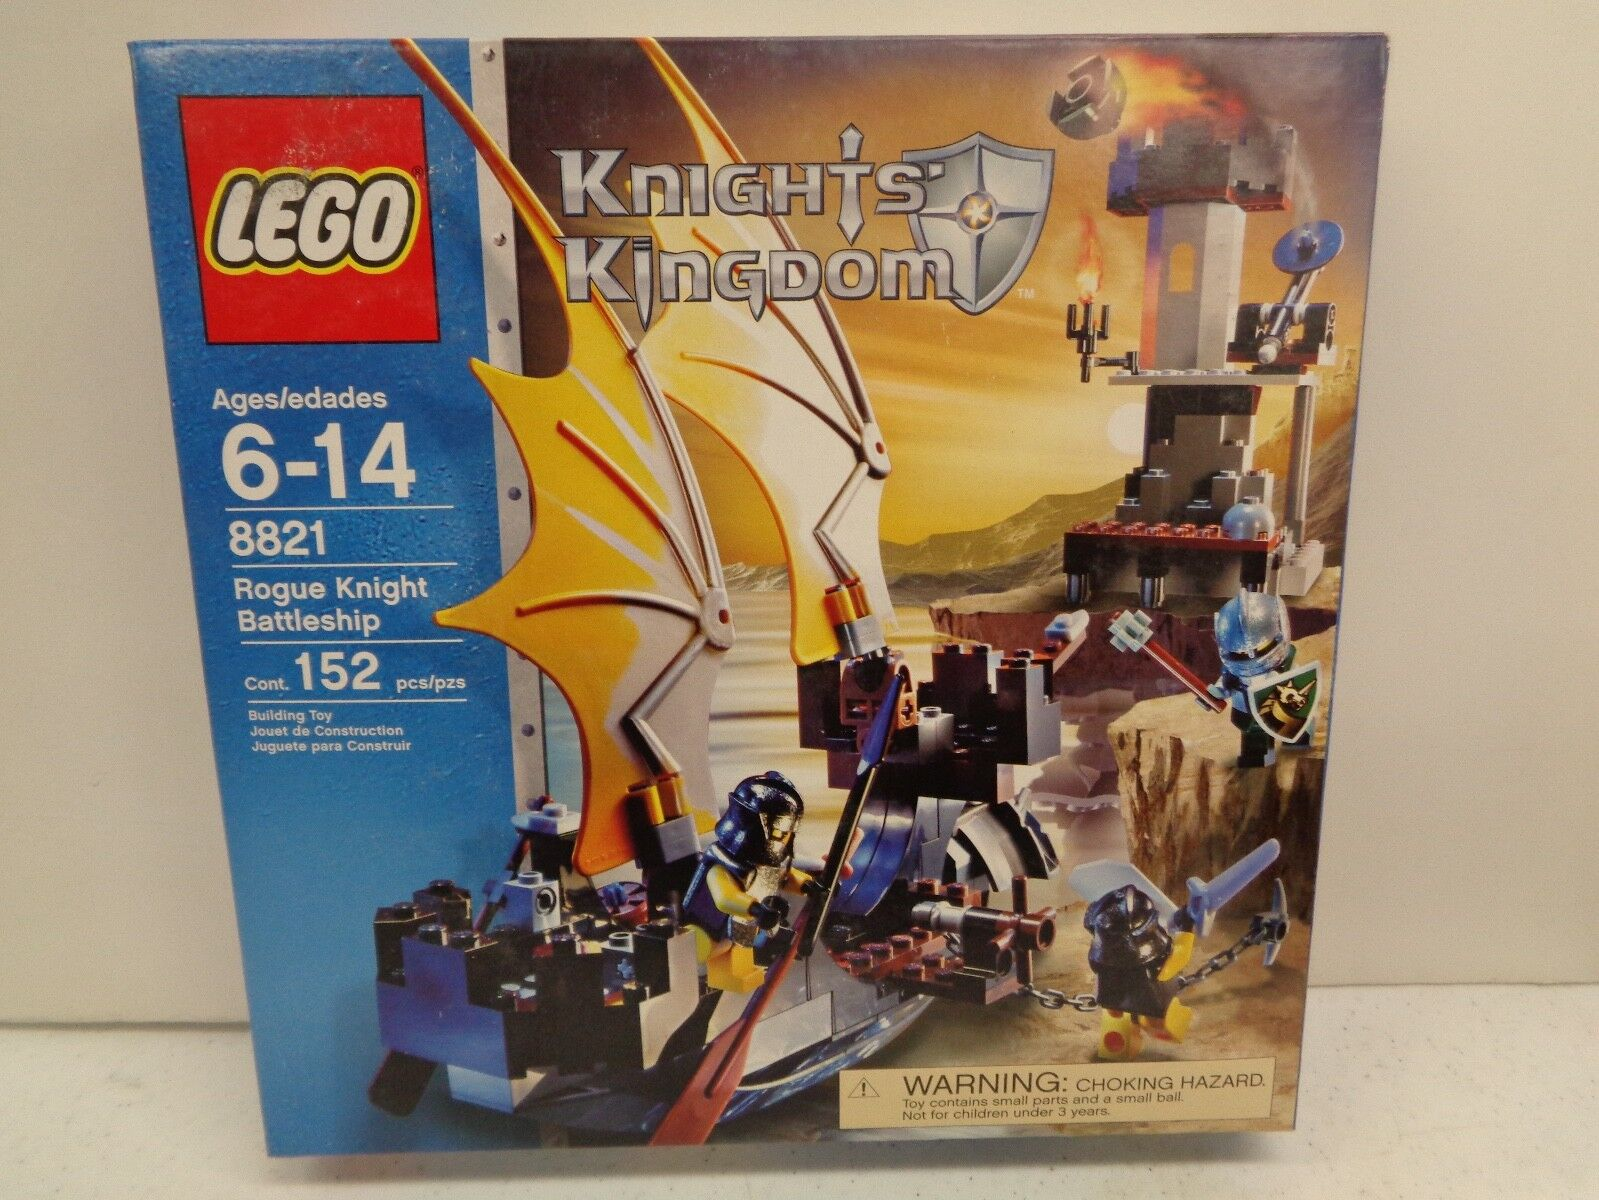 Lego Knight's Kingdom Rogue Knight Battleship Building Toy 8821 Age 6-14, 152 pc